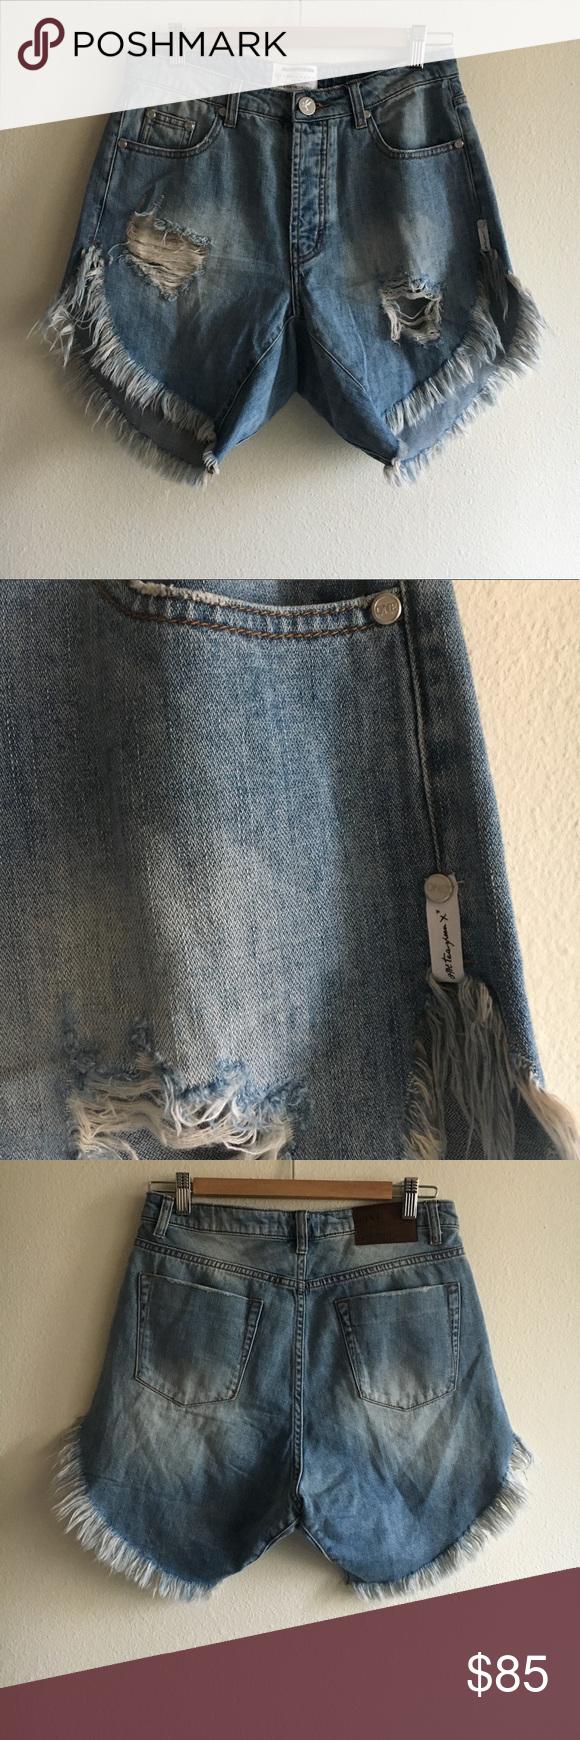 One Teaspoon For Free People Frankie S Shorts 25 Clothes Design Denim Wash Fashion